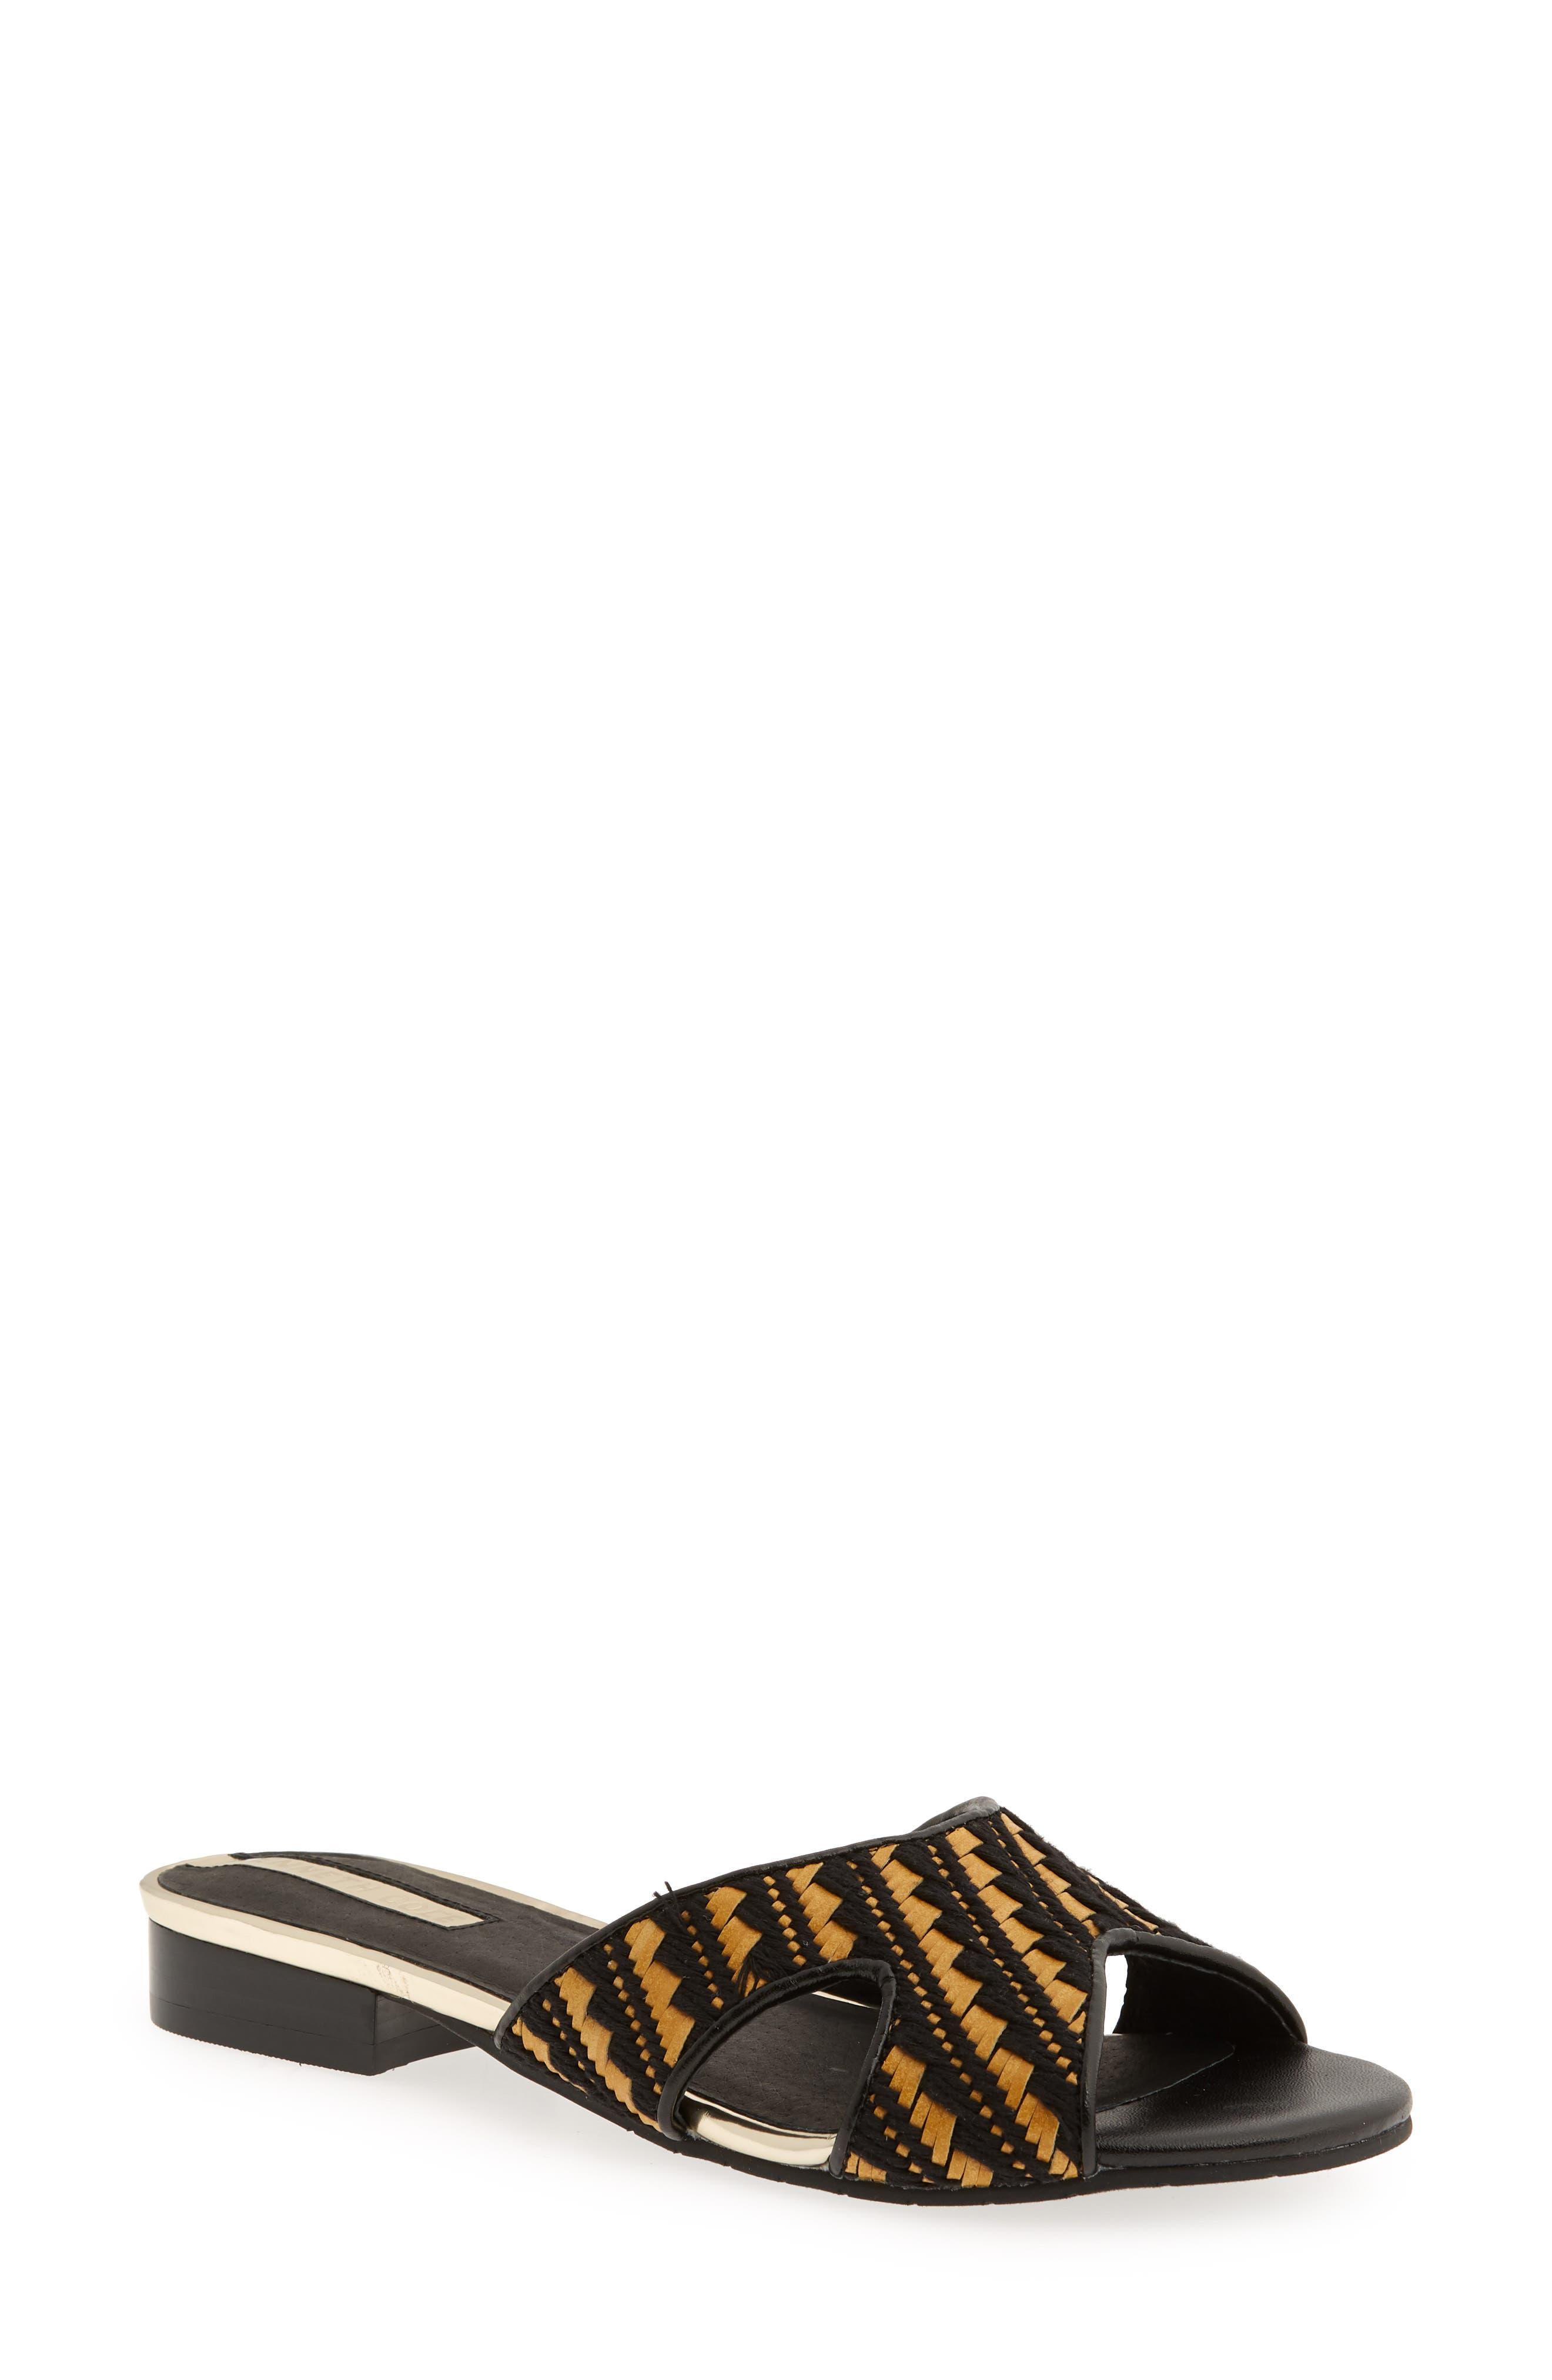 Viveca 2 Slide Sandal,                             Main thumbnail 1, color,                             Black/ Natural Fabric